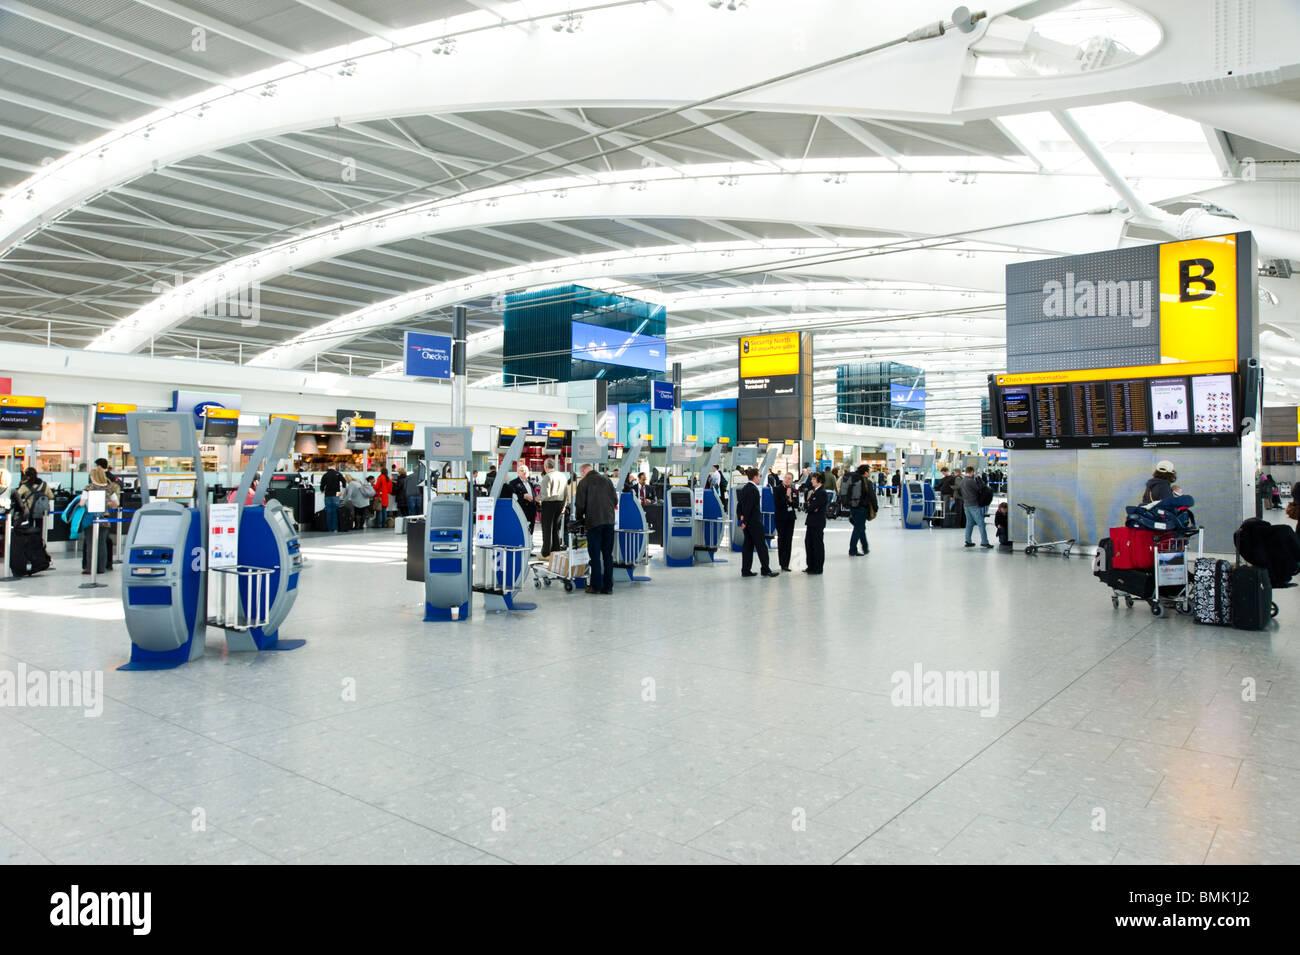 Heathrow Airport Terminal 5, London, England, UK - Stock Image